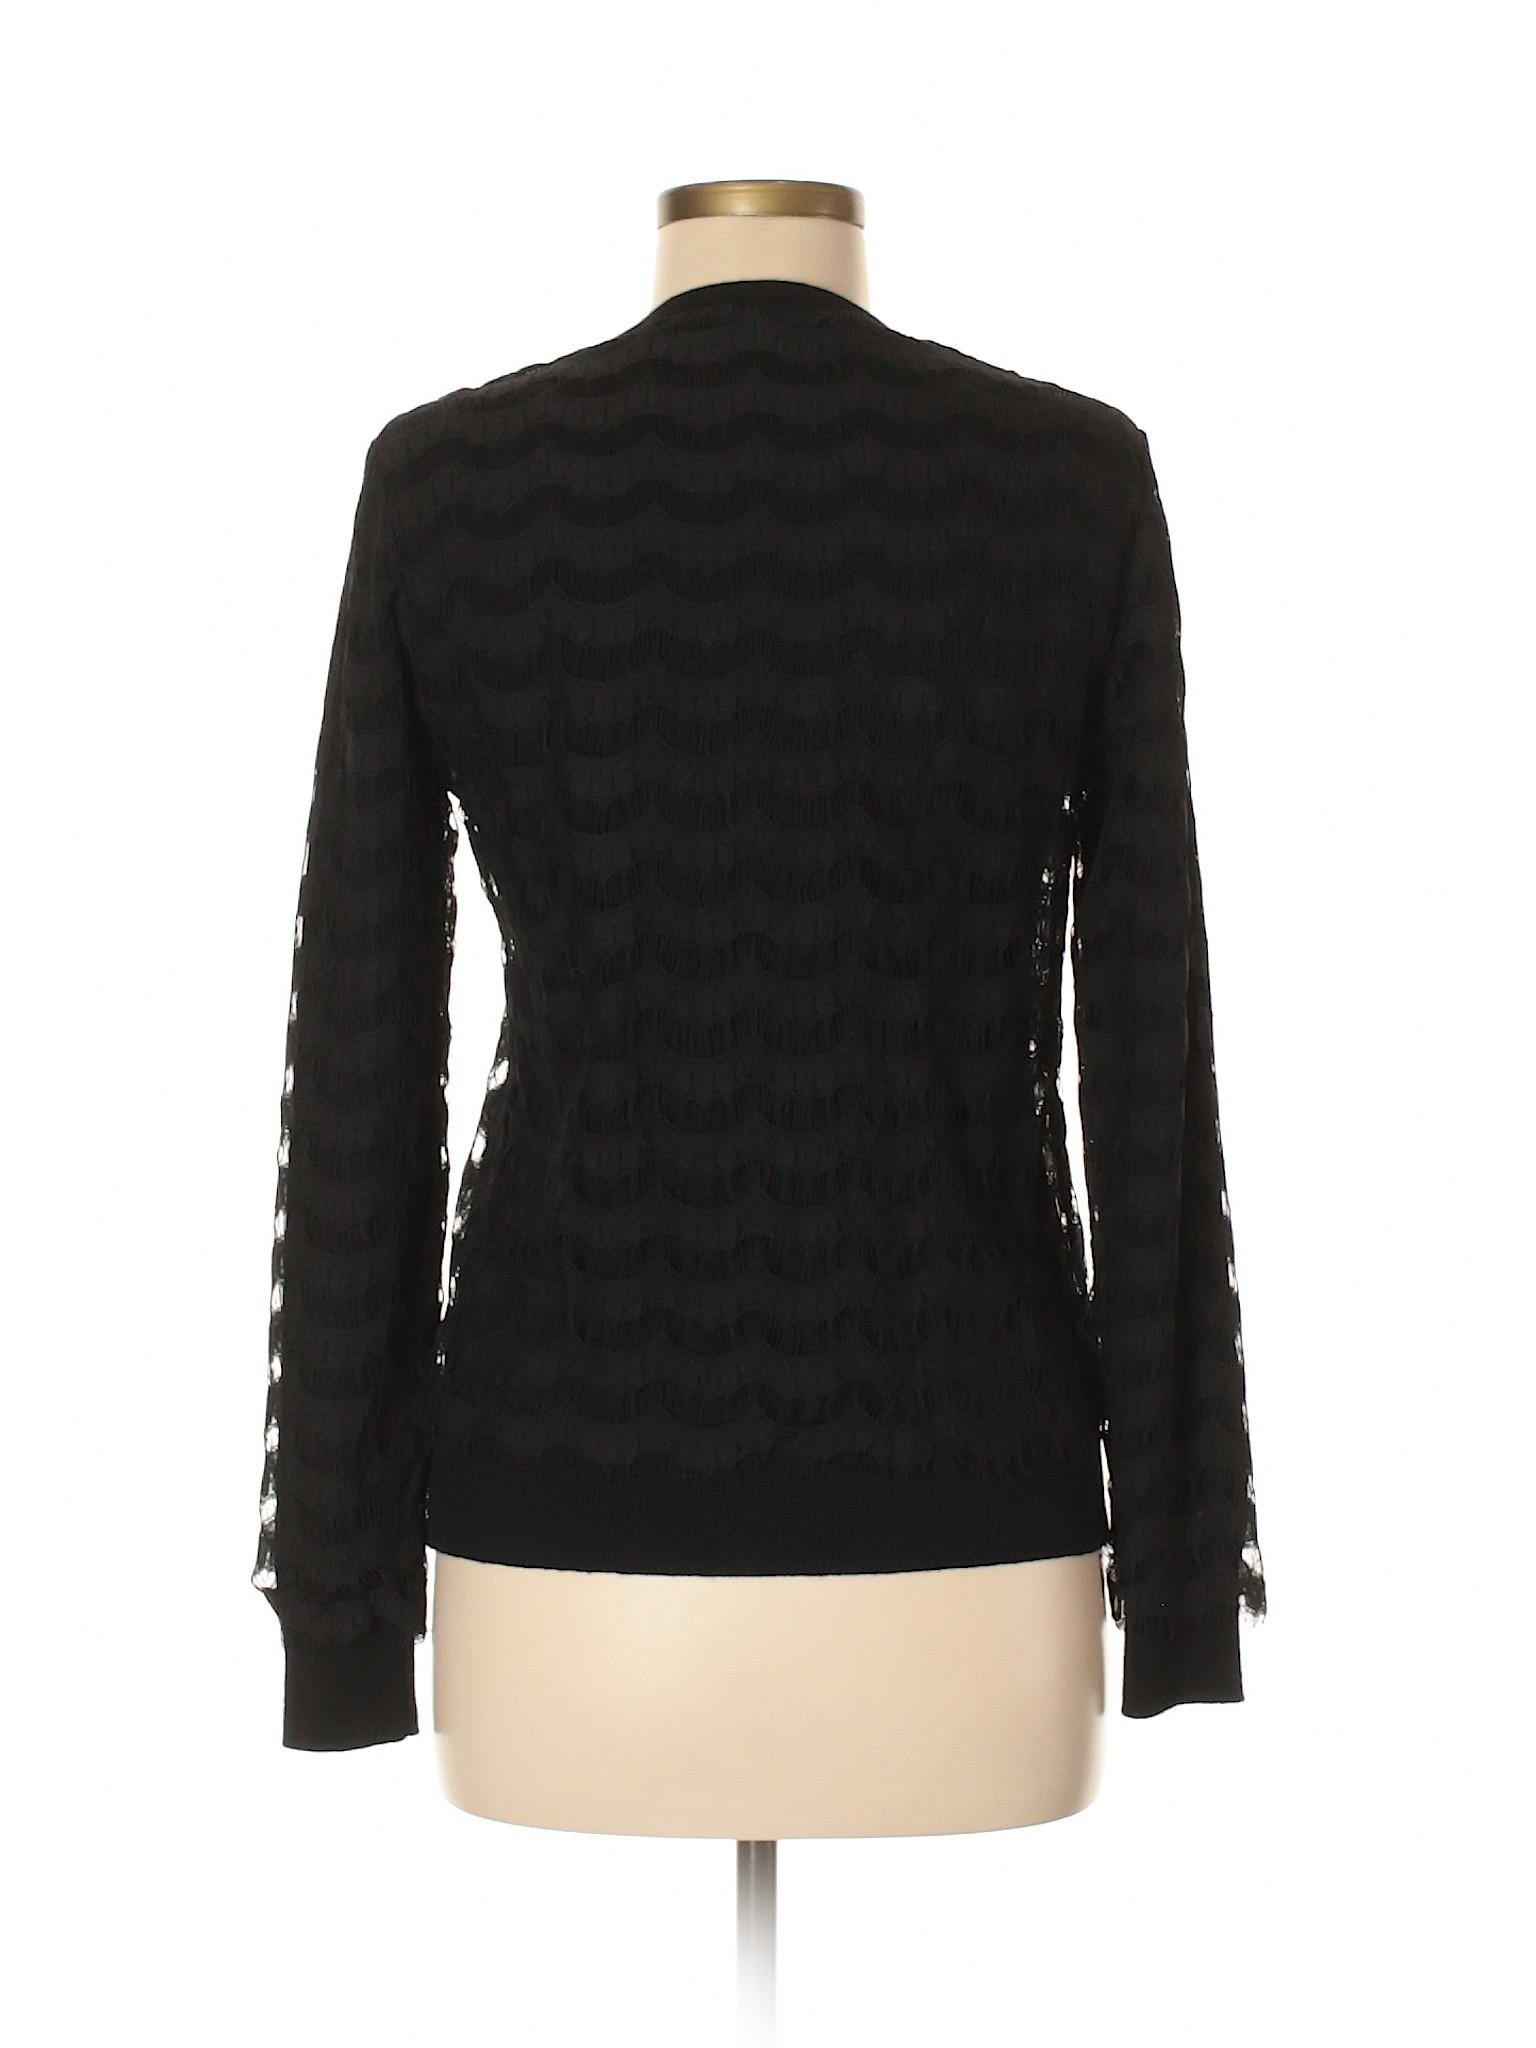 Cardigan Turk Trina Boutique Wool Boutique Trina wnfgzqXS